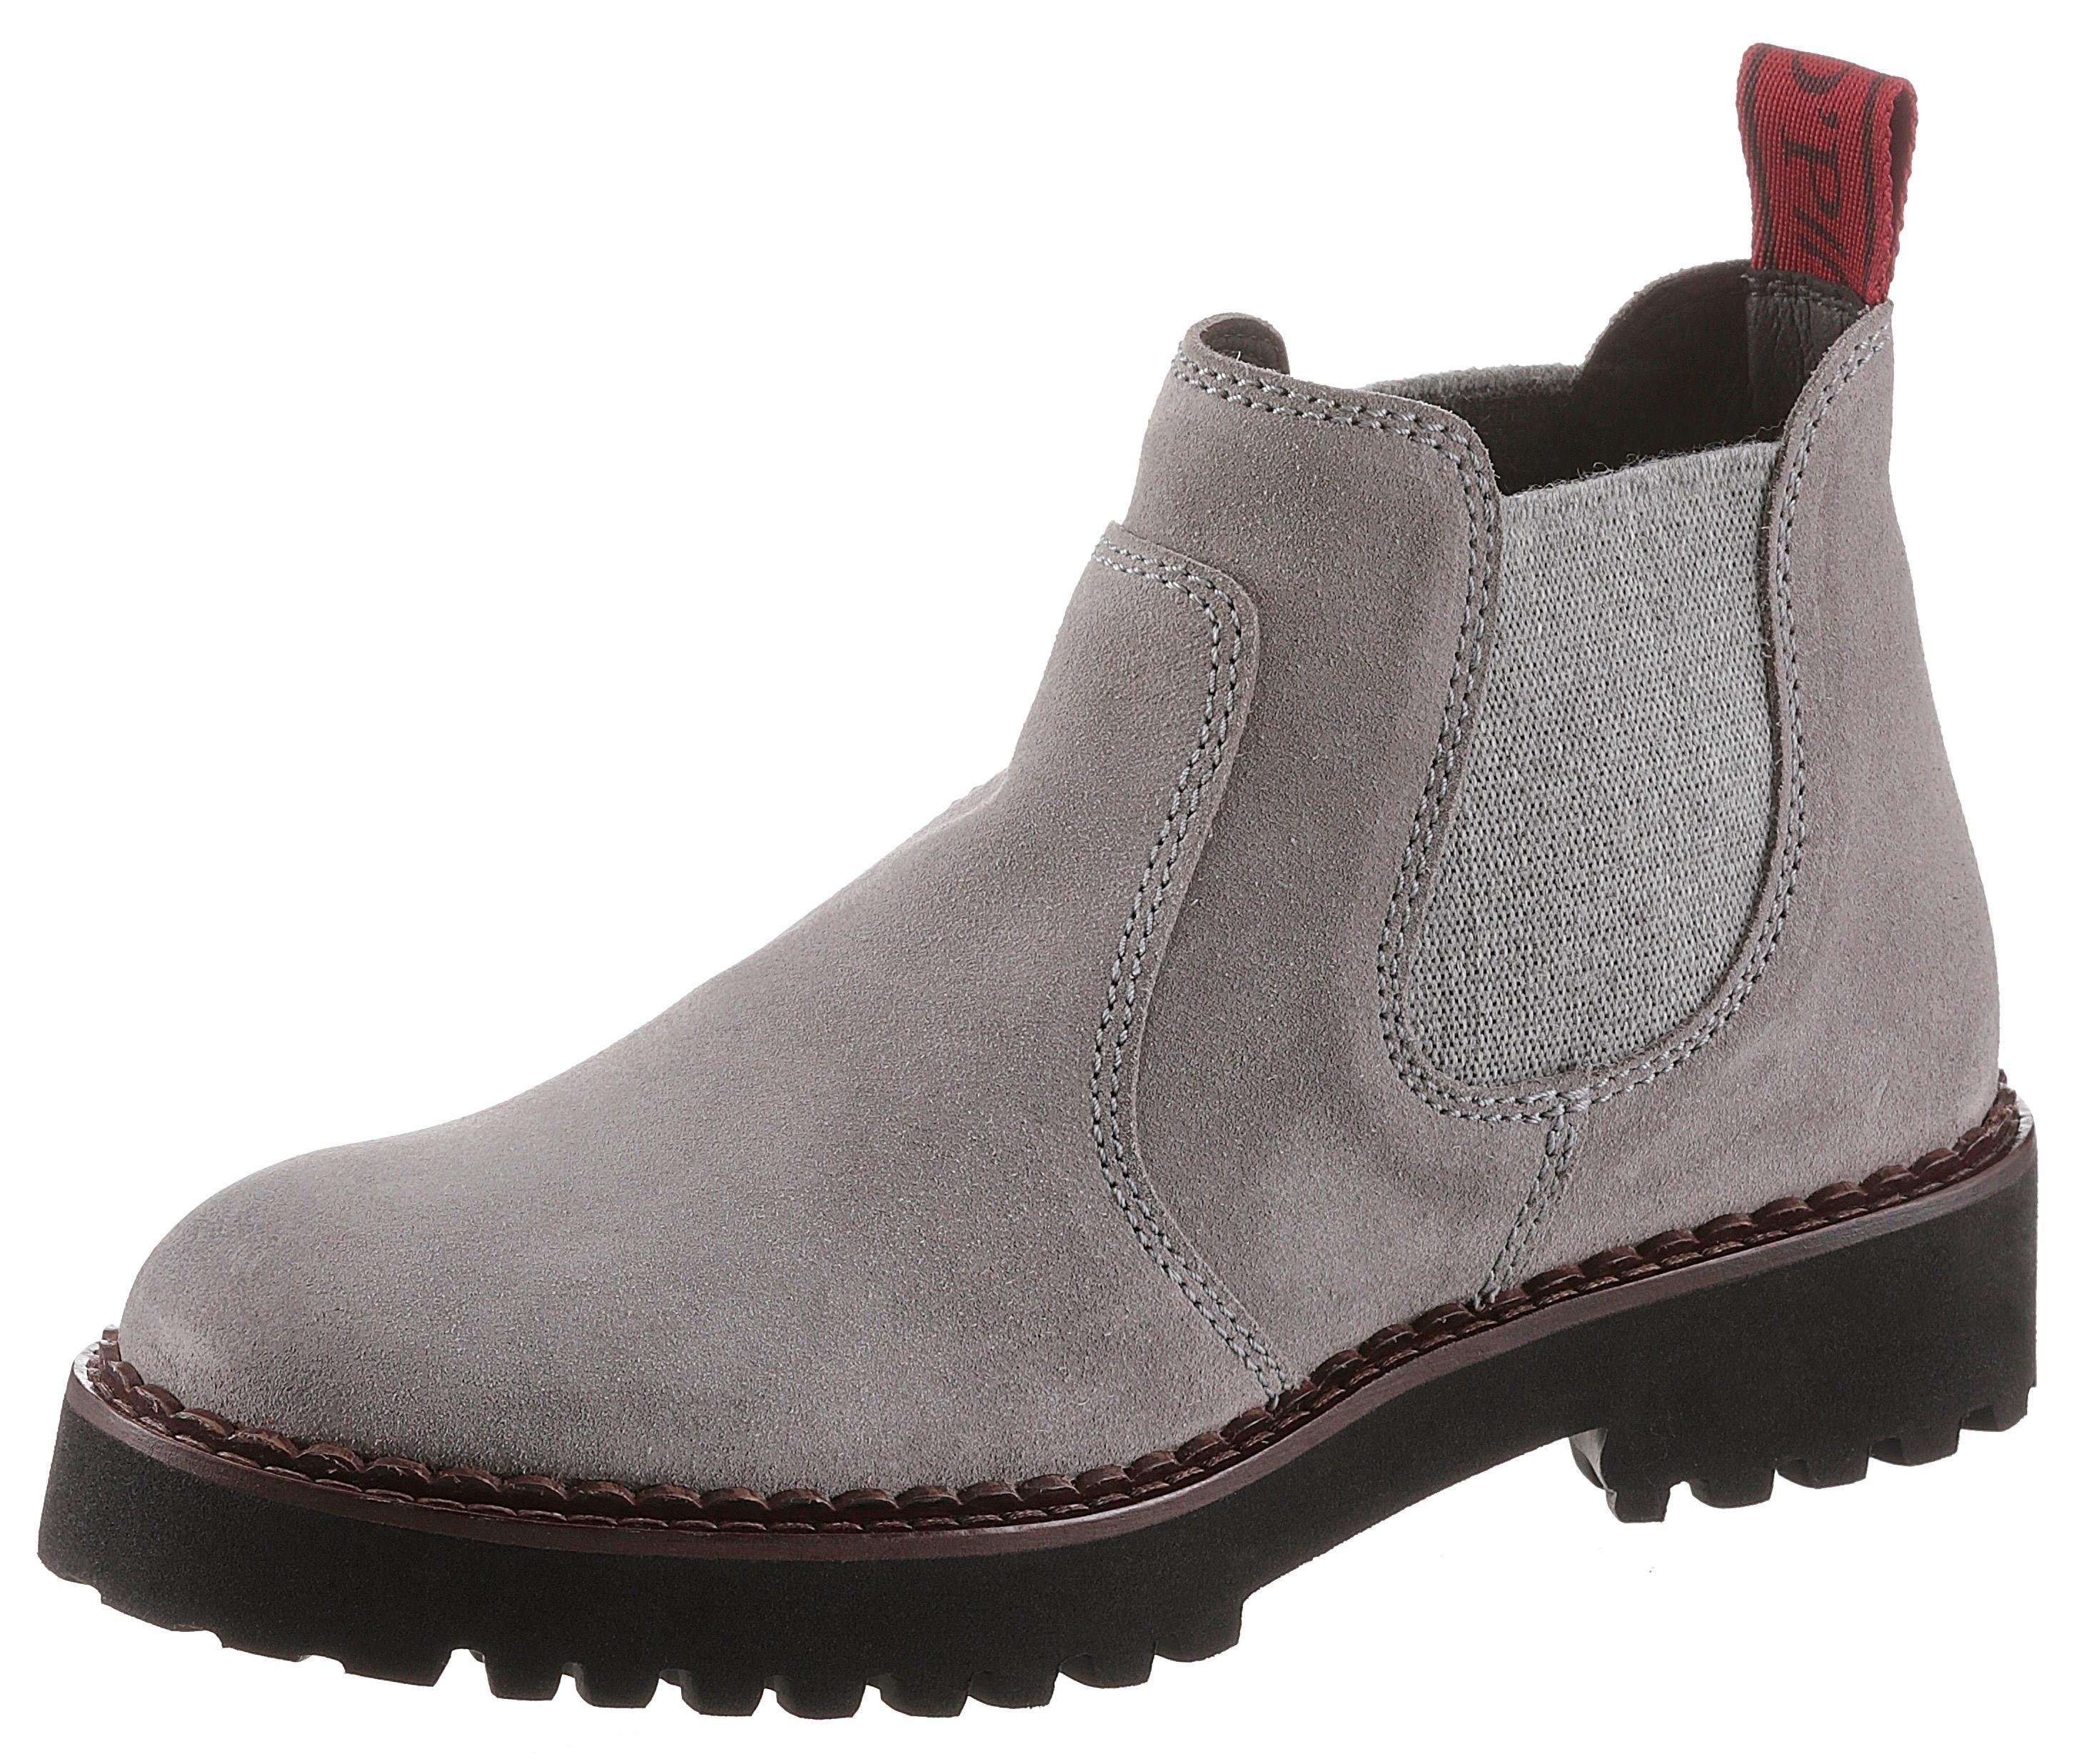 Marc O'Polo chelsea-boots nu online kopen bij OTTO